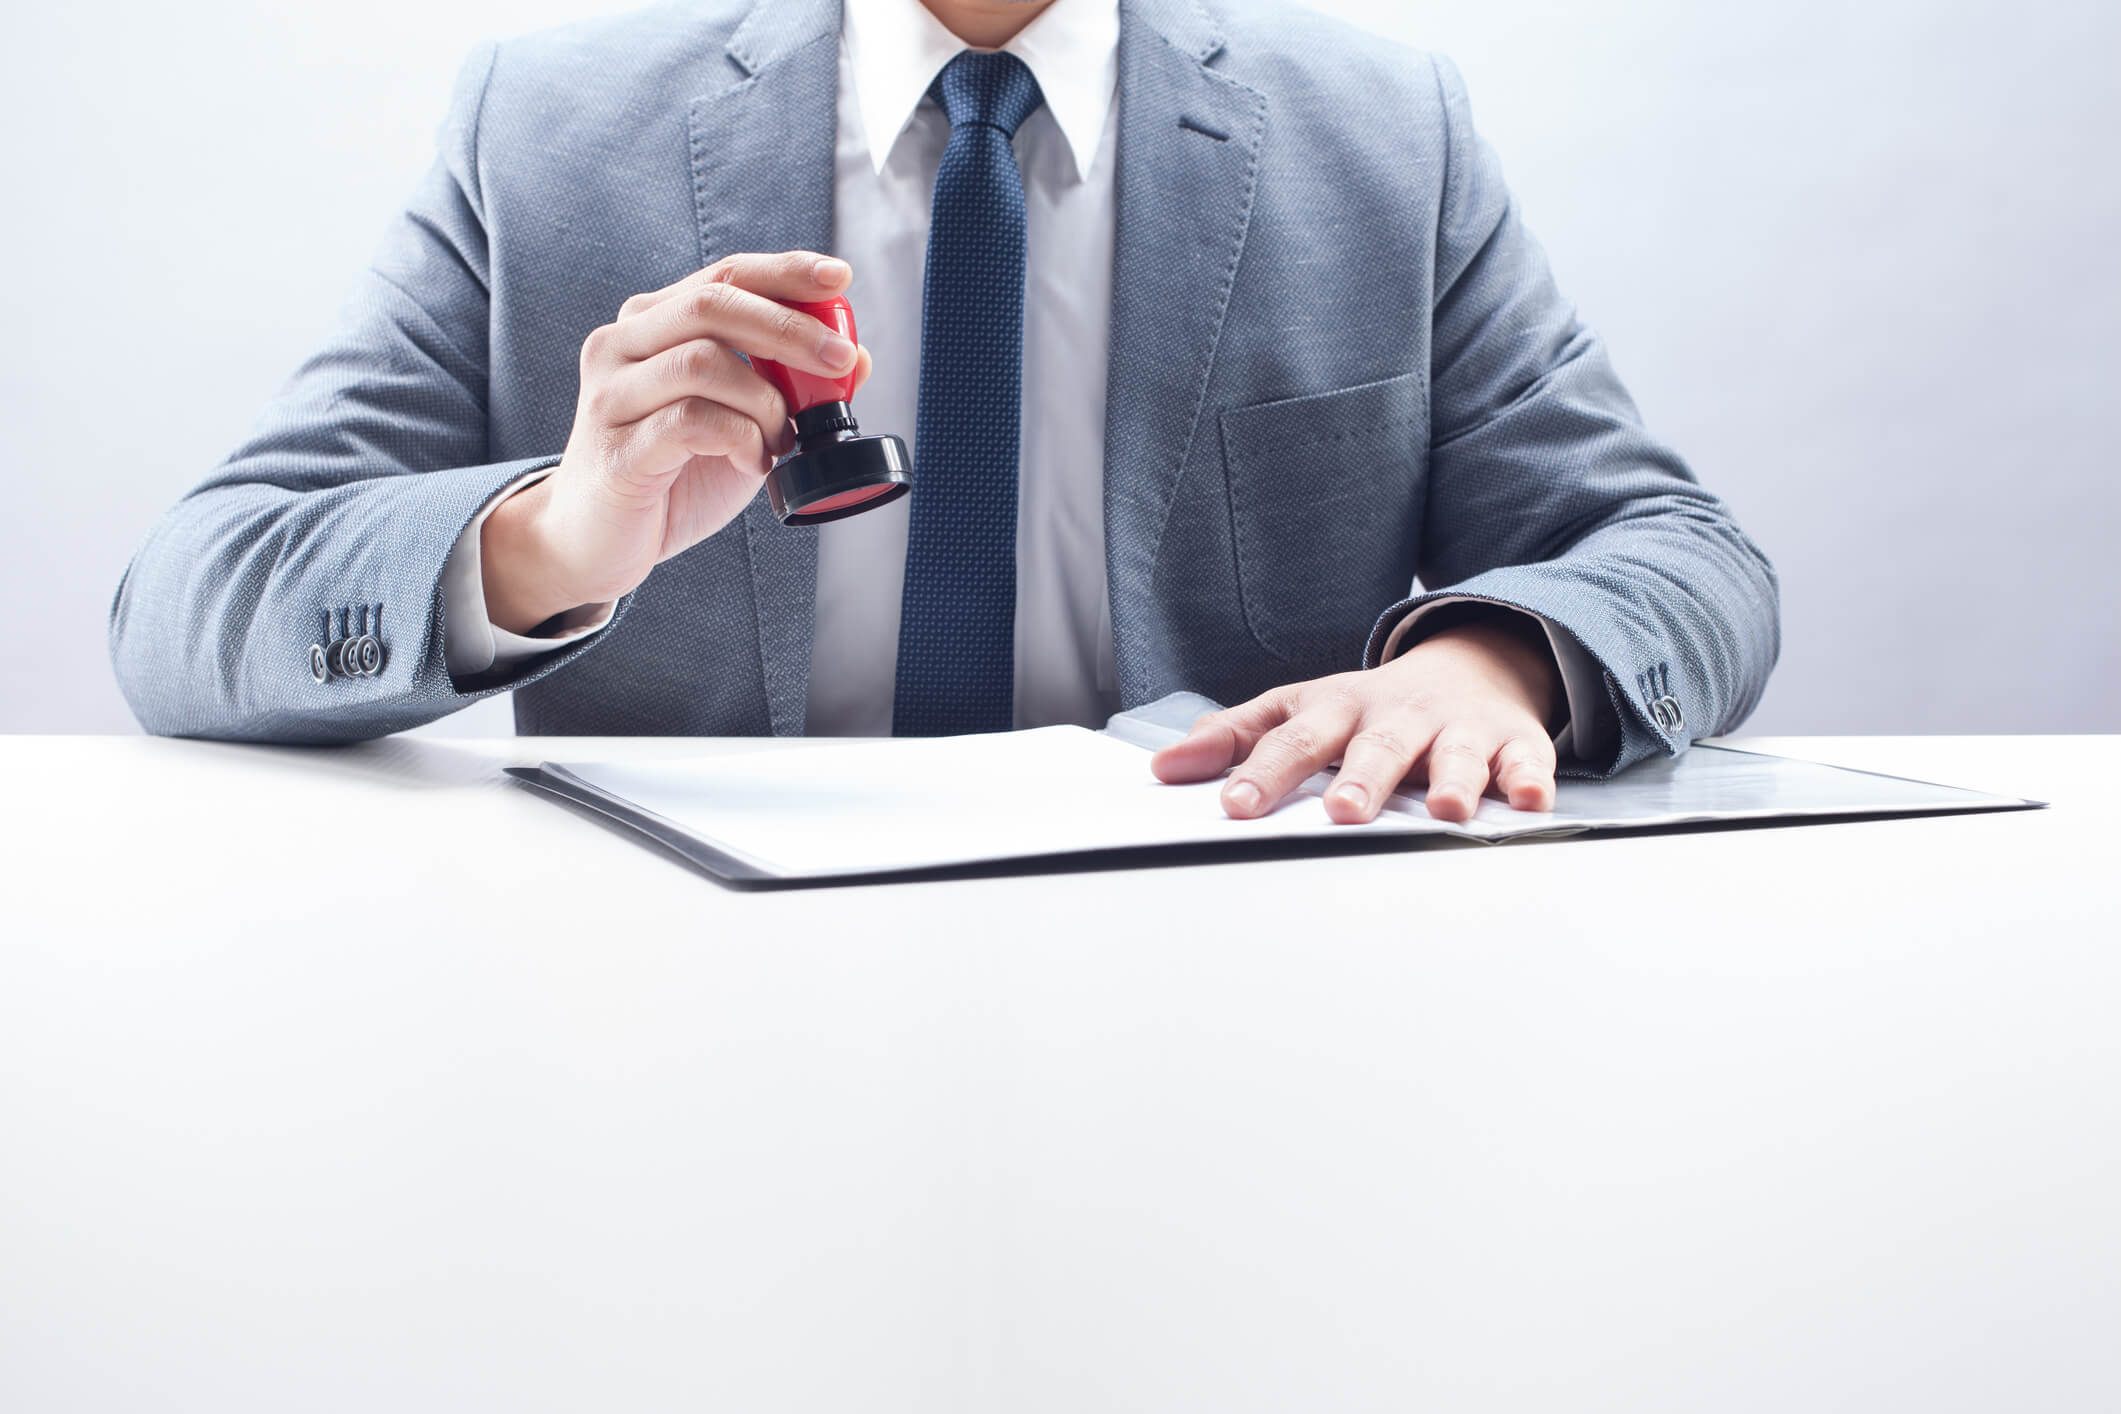 ringi decision-making in Japanese companies